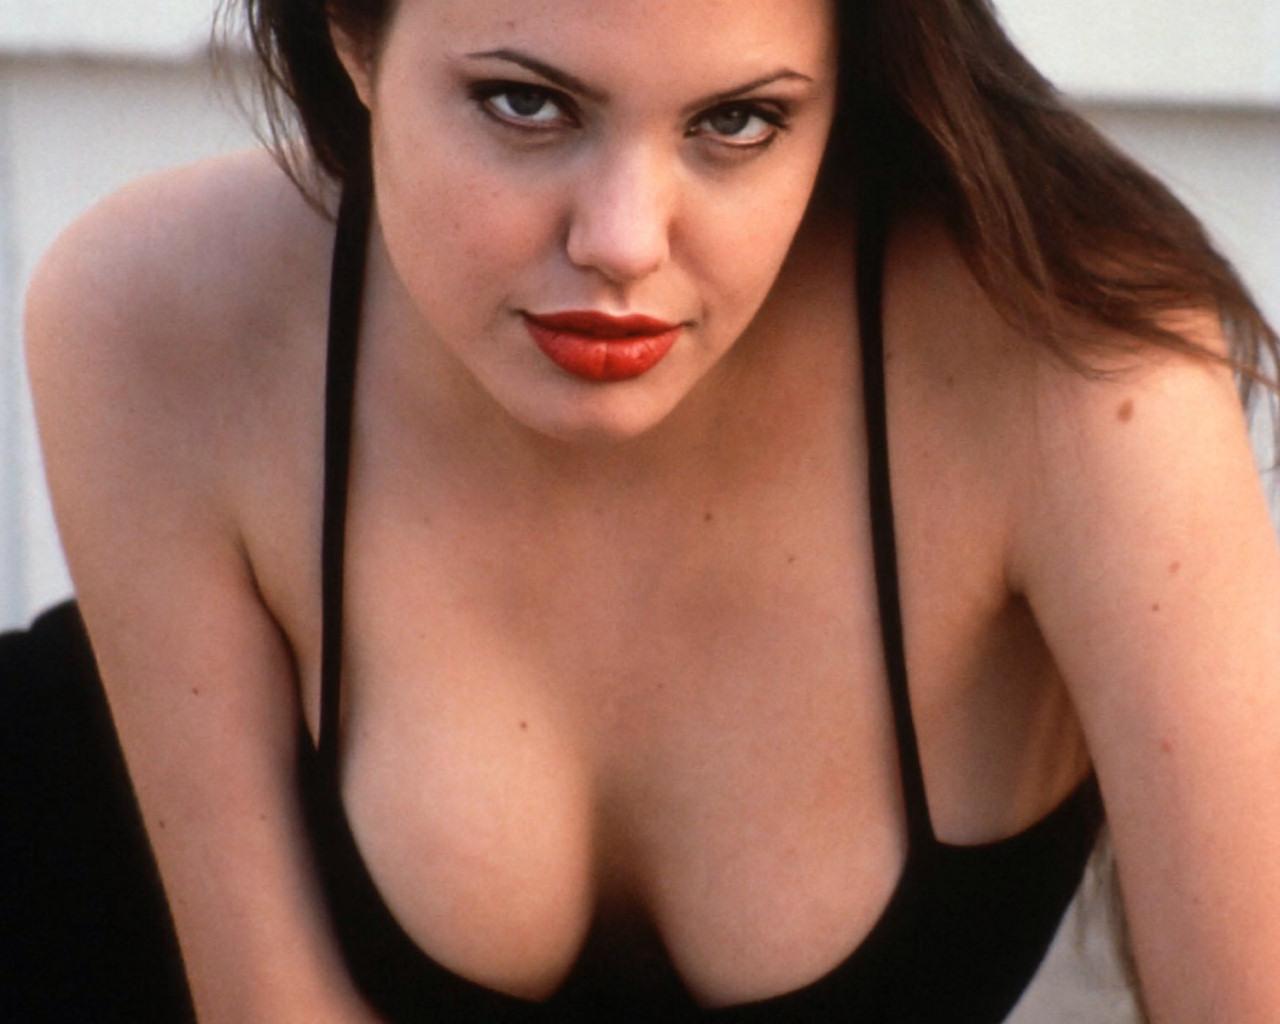 hollywood actress angelina jolie Search - XVIDEOSCOM